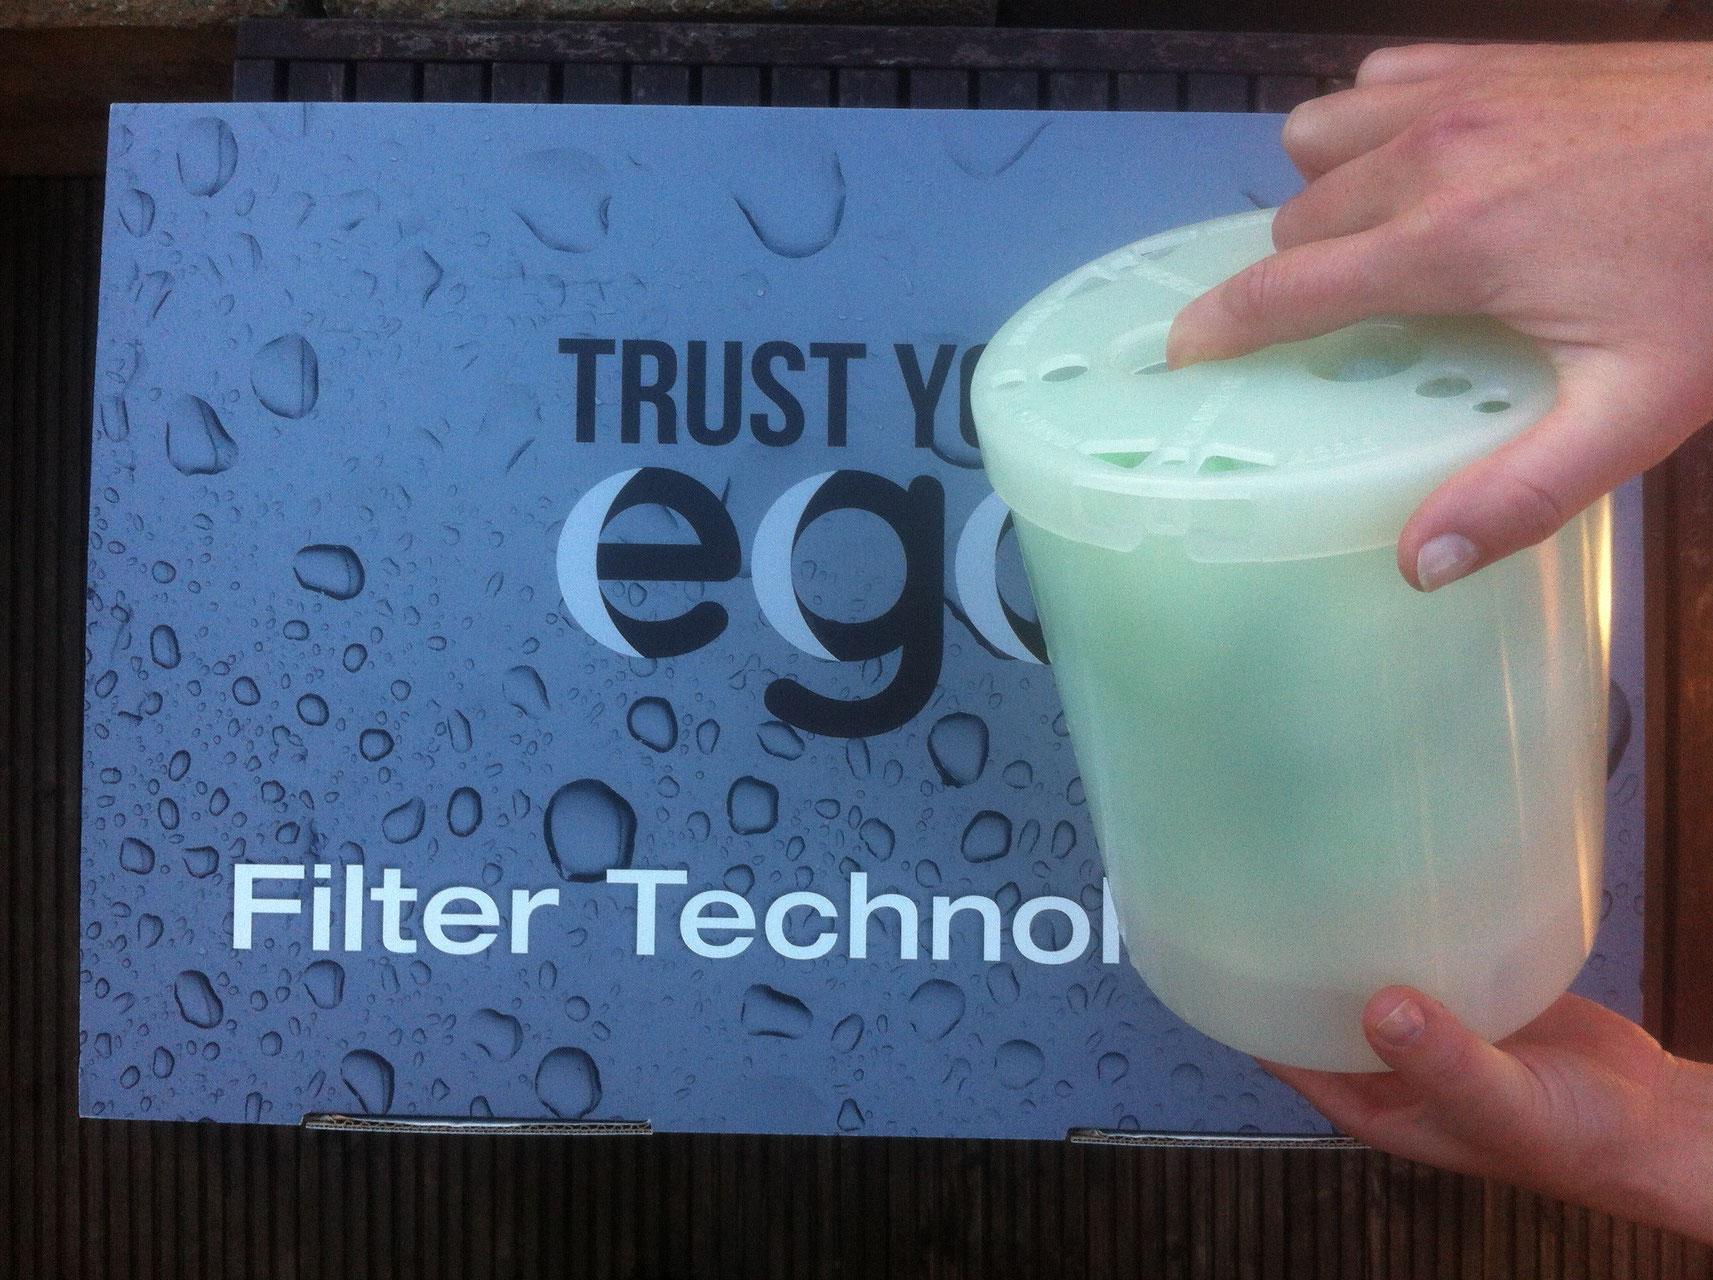 Whirlpool filter reinigen whirlpoolfilter reinigen whirlpool filter whirlpoolfilter - Pool filter reinigen ...